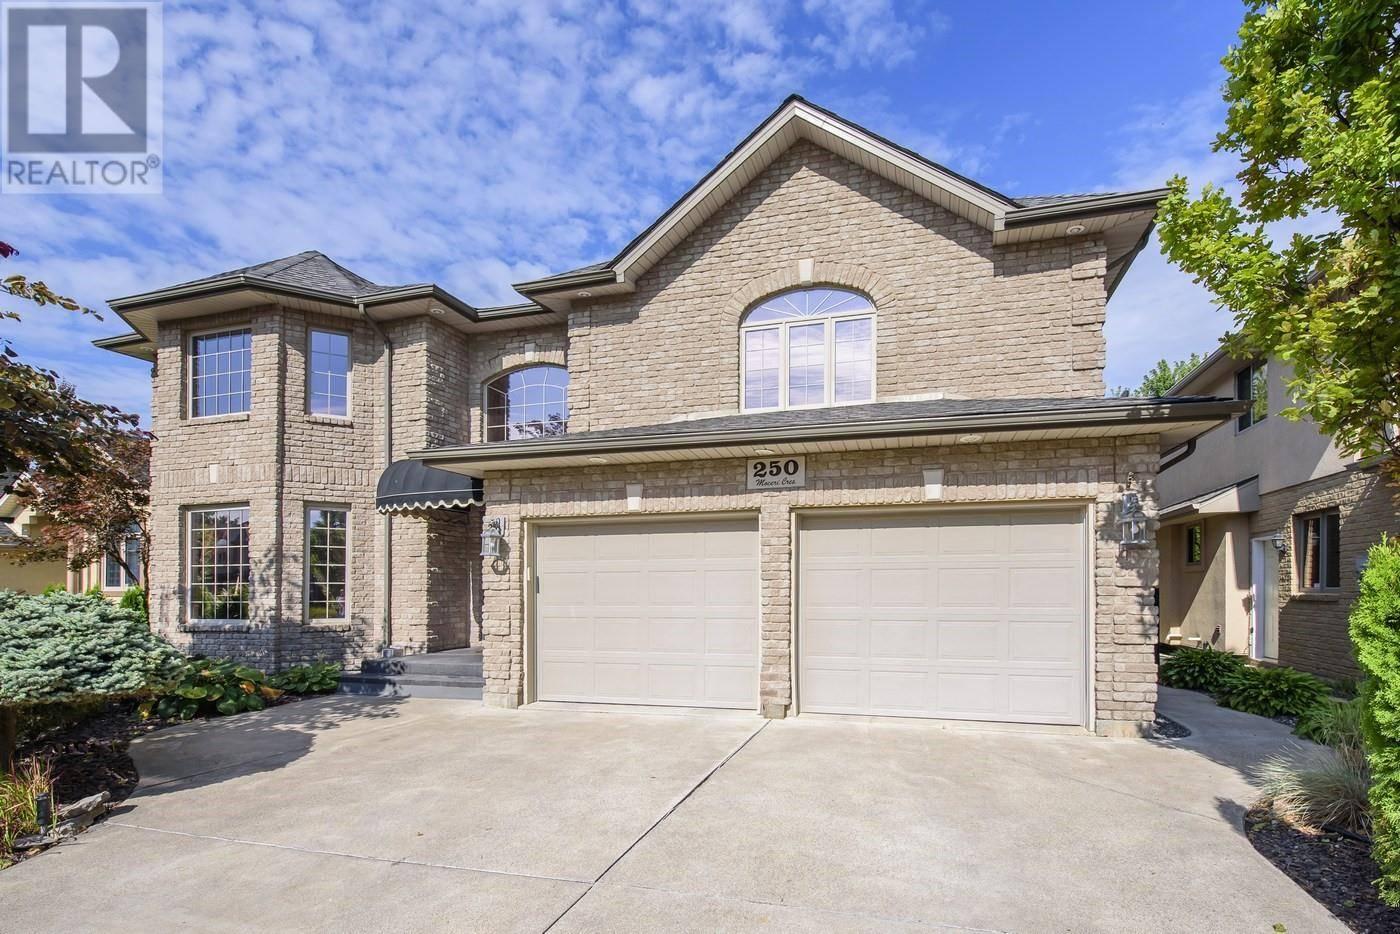 House for sale at 250 Moceri  Lakeshore Ontario - MLS: 19023664